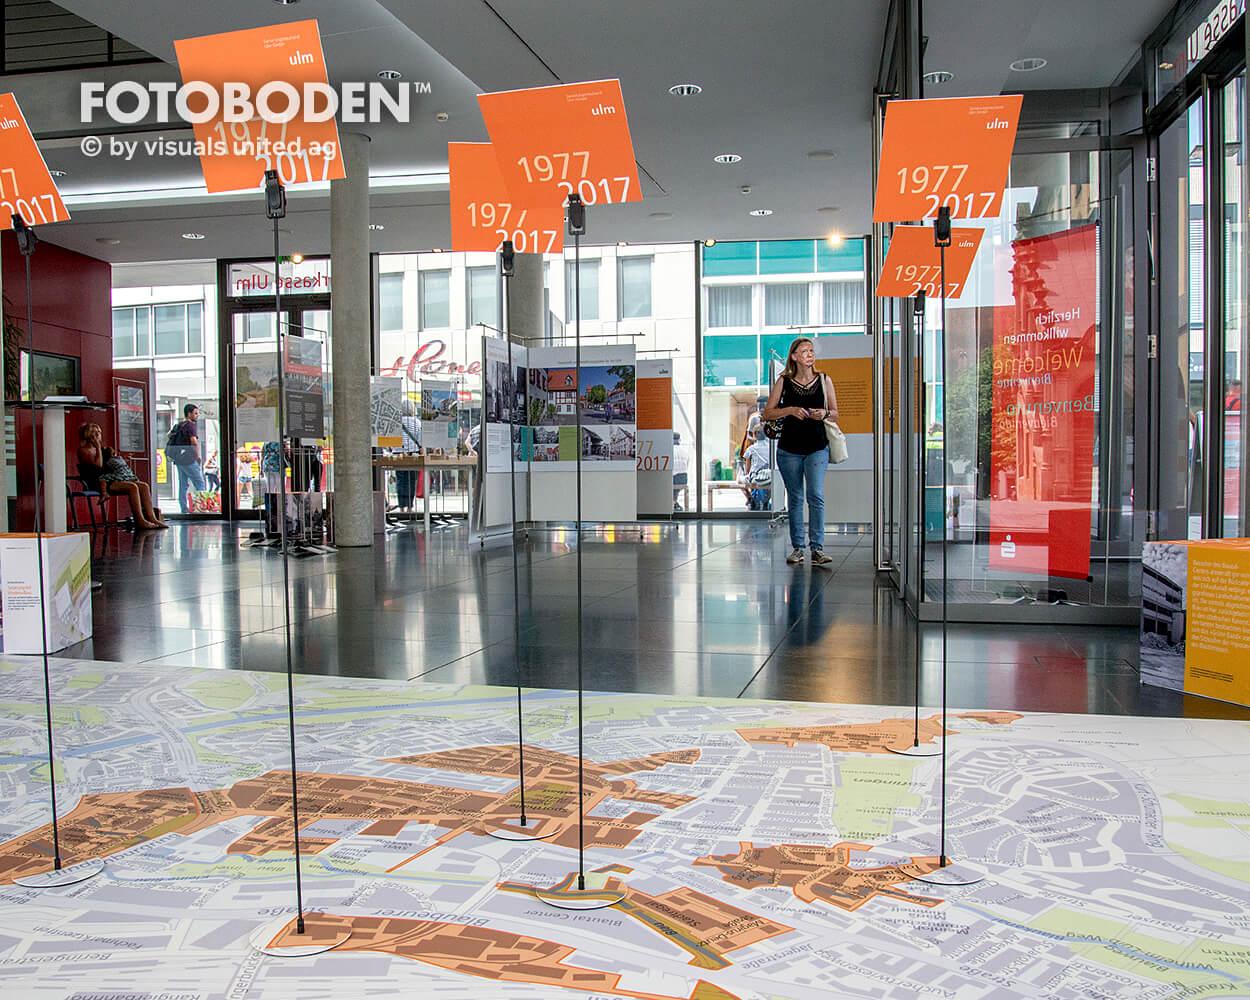 Sparkasse Ulm Ausstellung Museum  Raumkonzept Stimmung Museumsboden Ausstellungsboden Fotoboden Vinylboden Flooring Individuell Event5